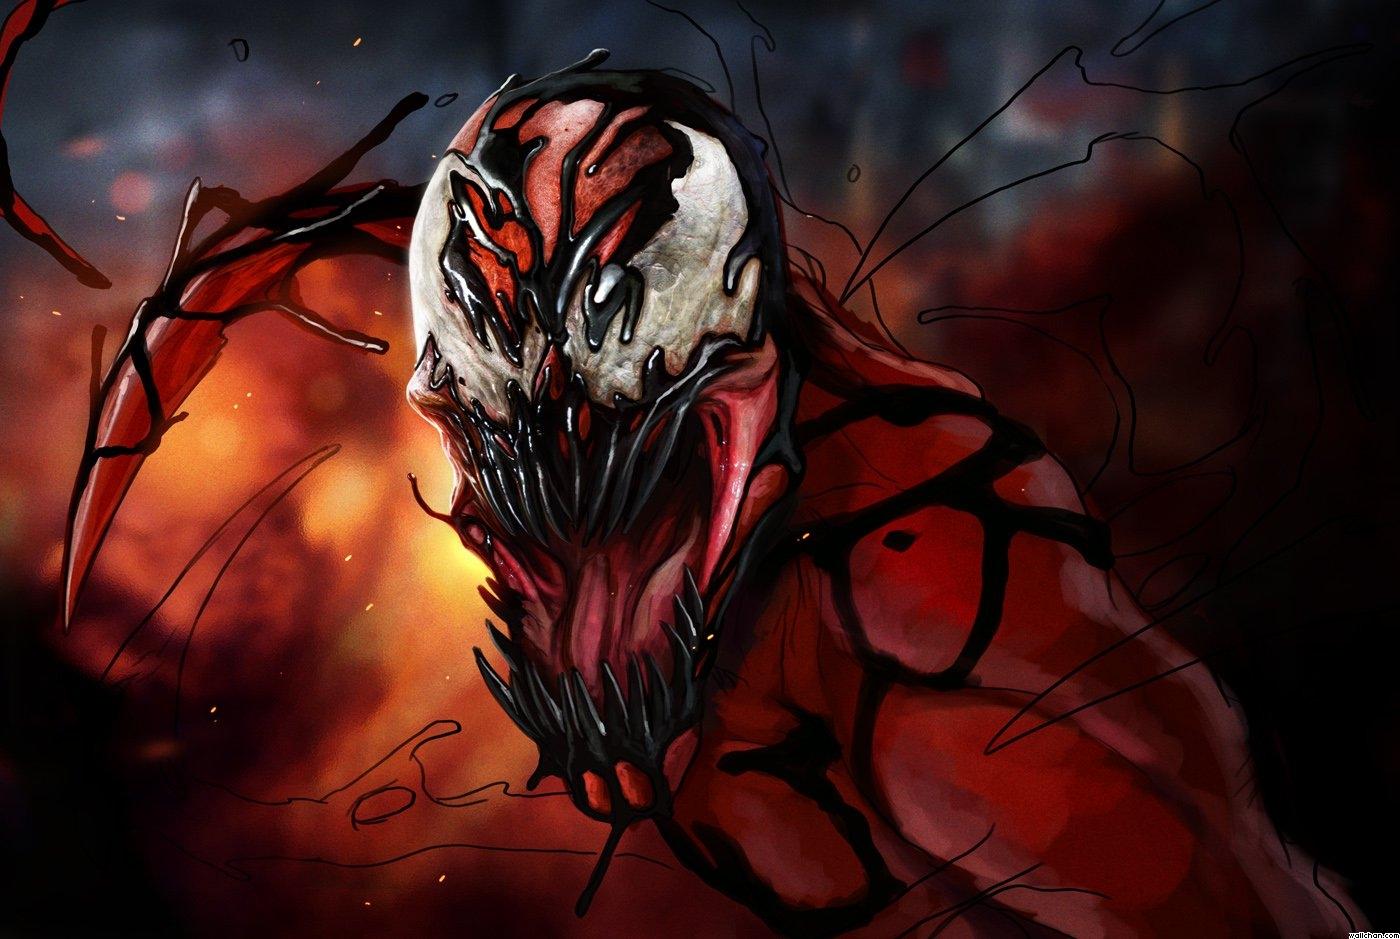 Spiderman 4 Venom Spiderman venom wallpaper hd 1400x939